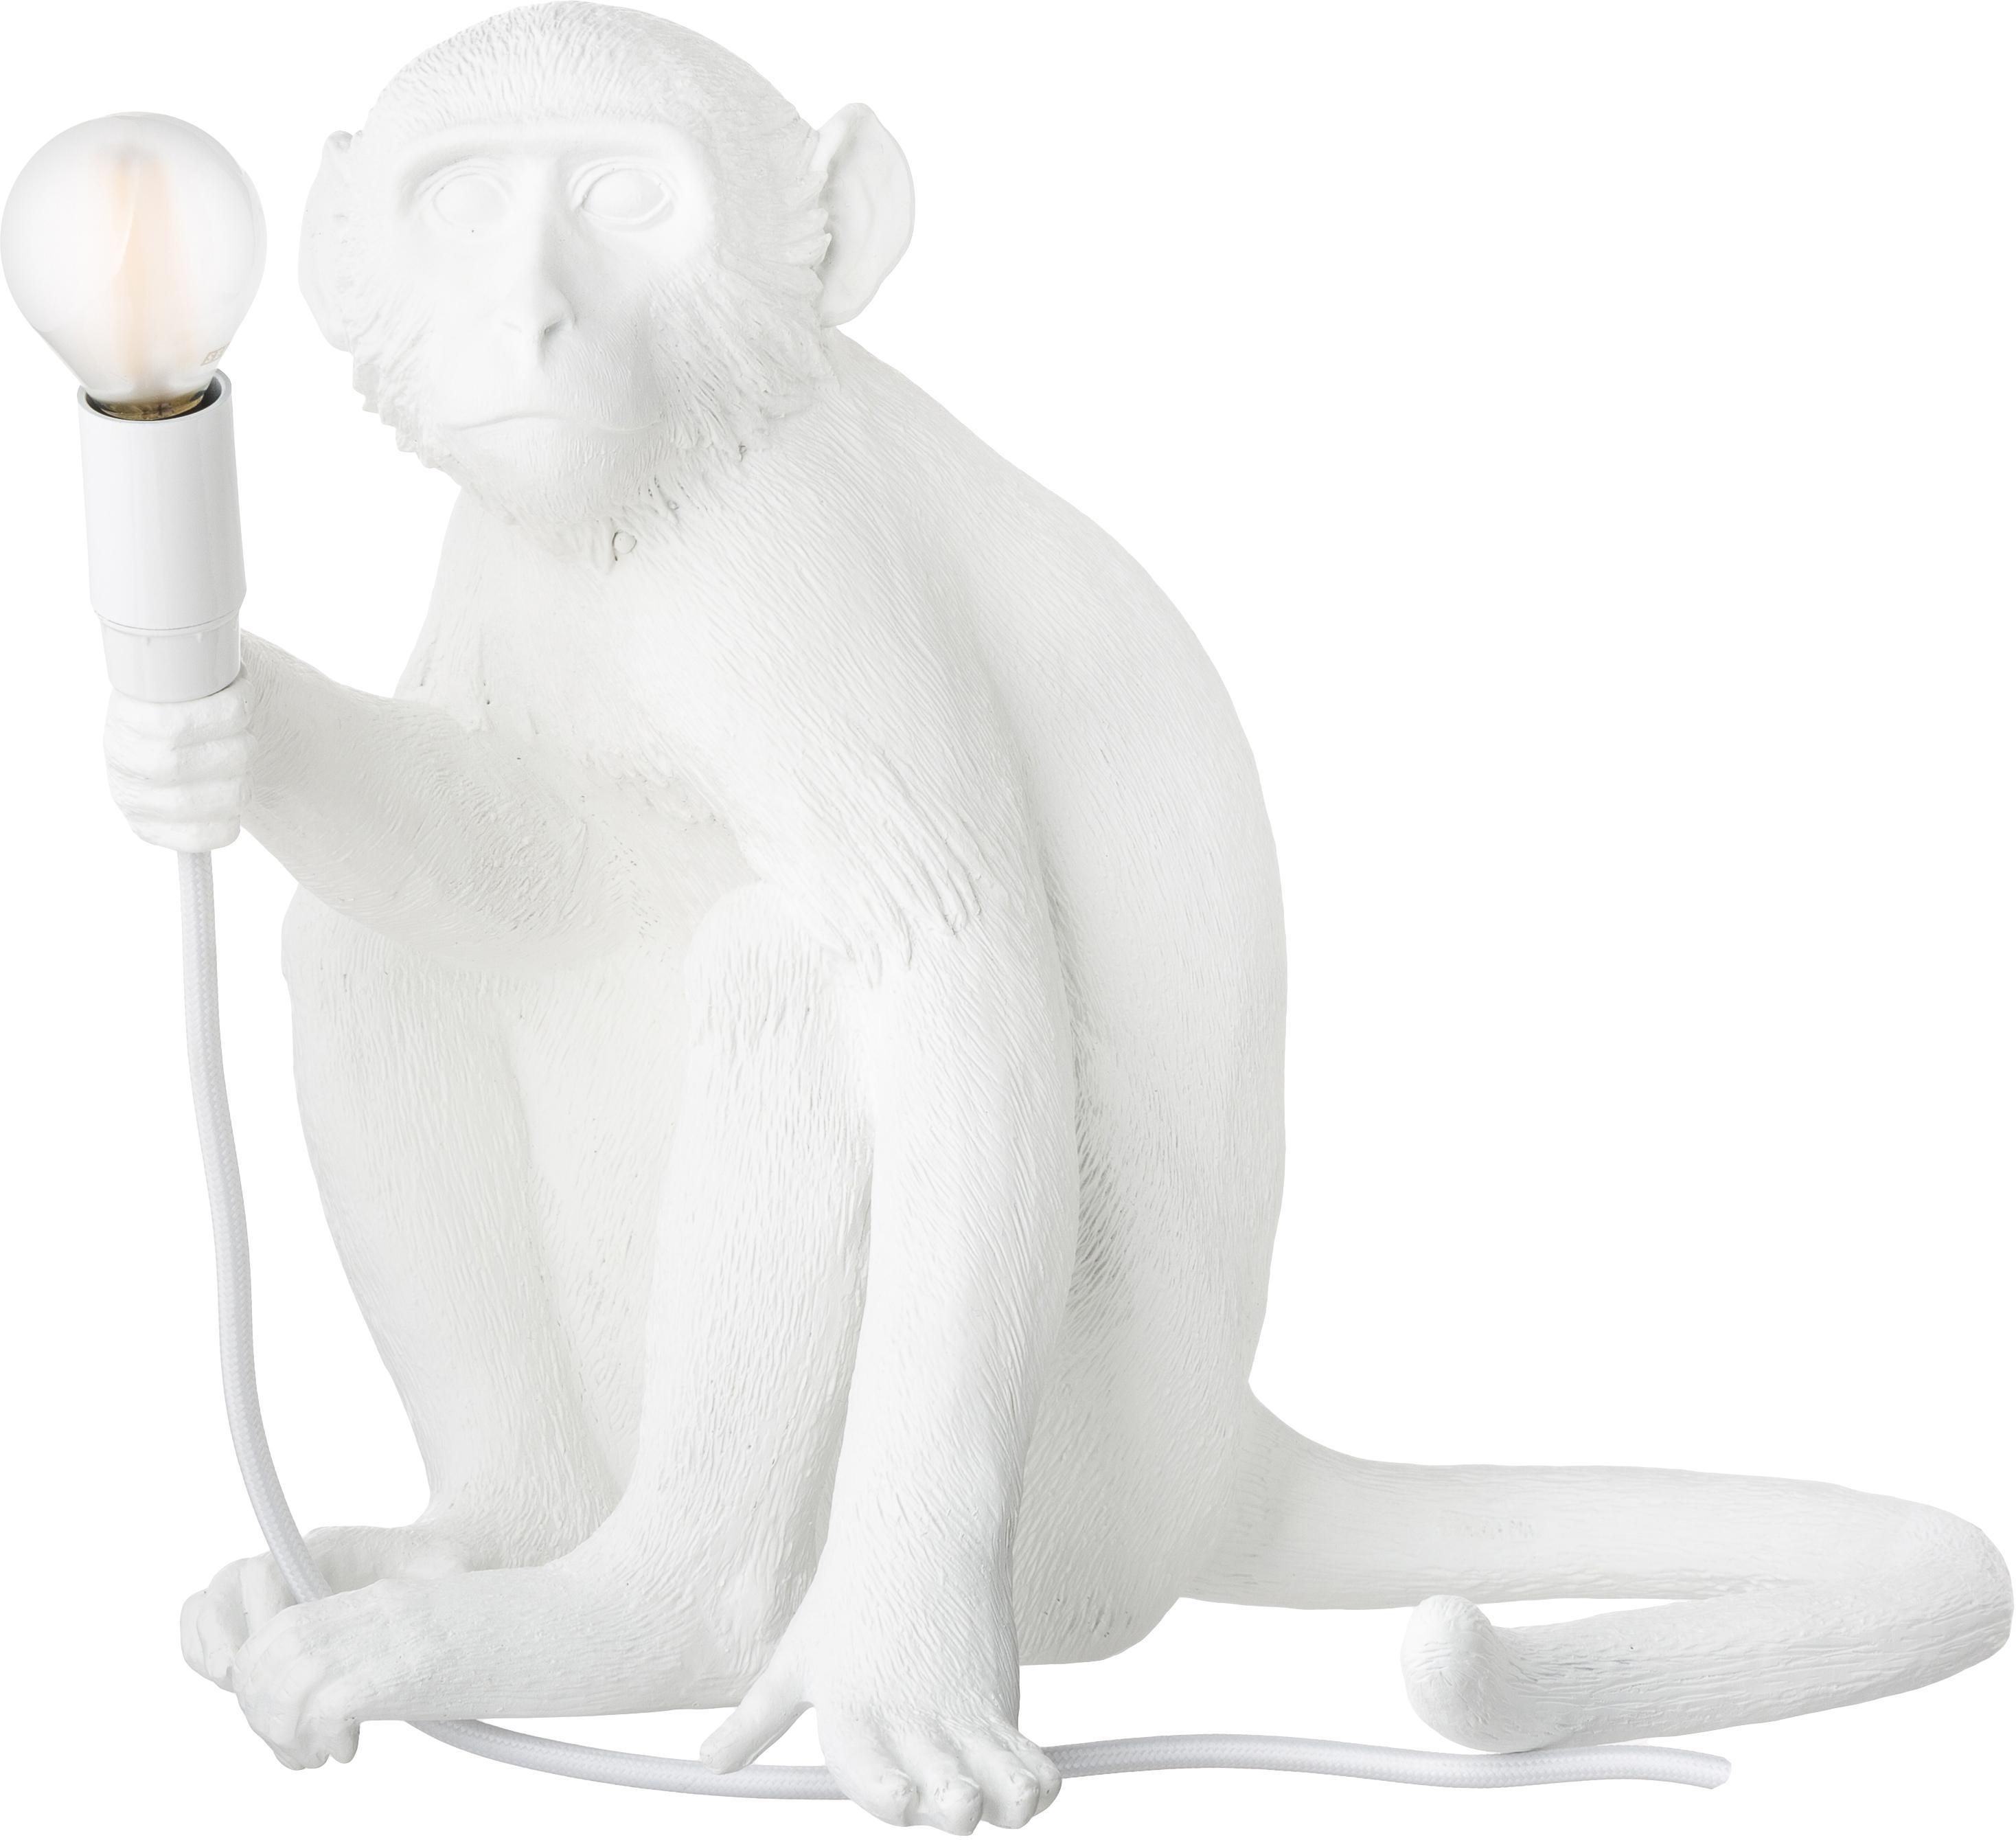 Lampada da tavolo a LED Monkey, Lampada: resina sintetica, Bianco, Larg. 34 x Alt. 32 cm